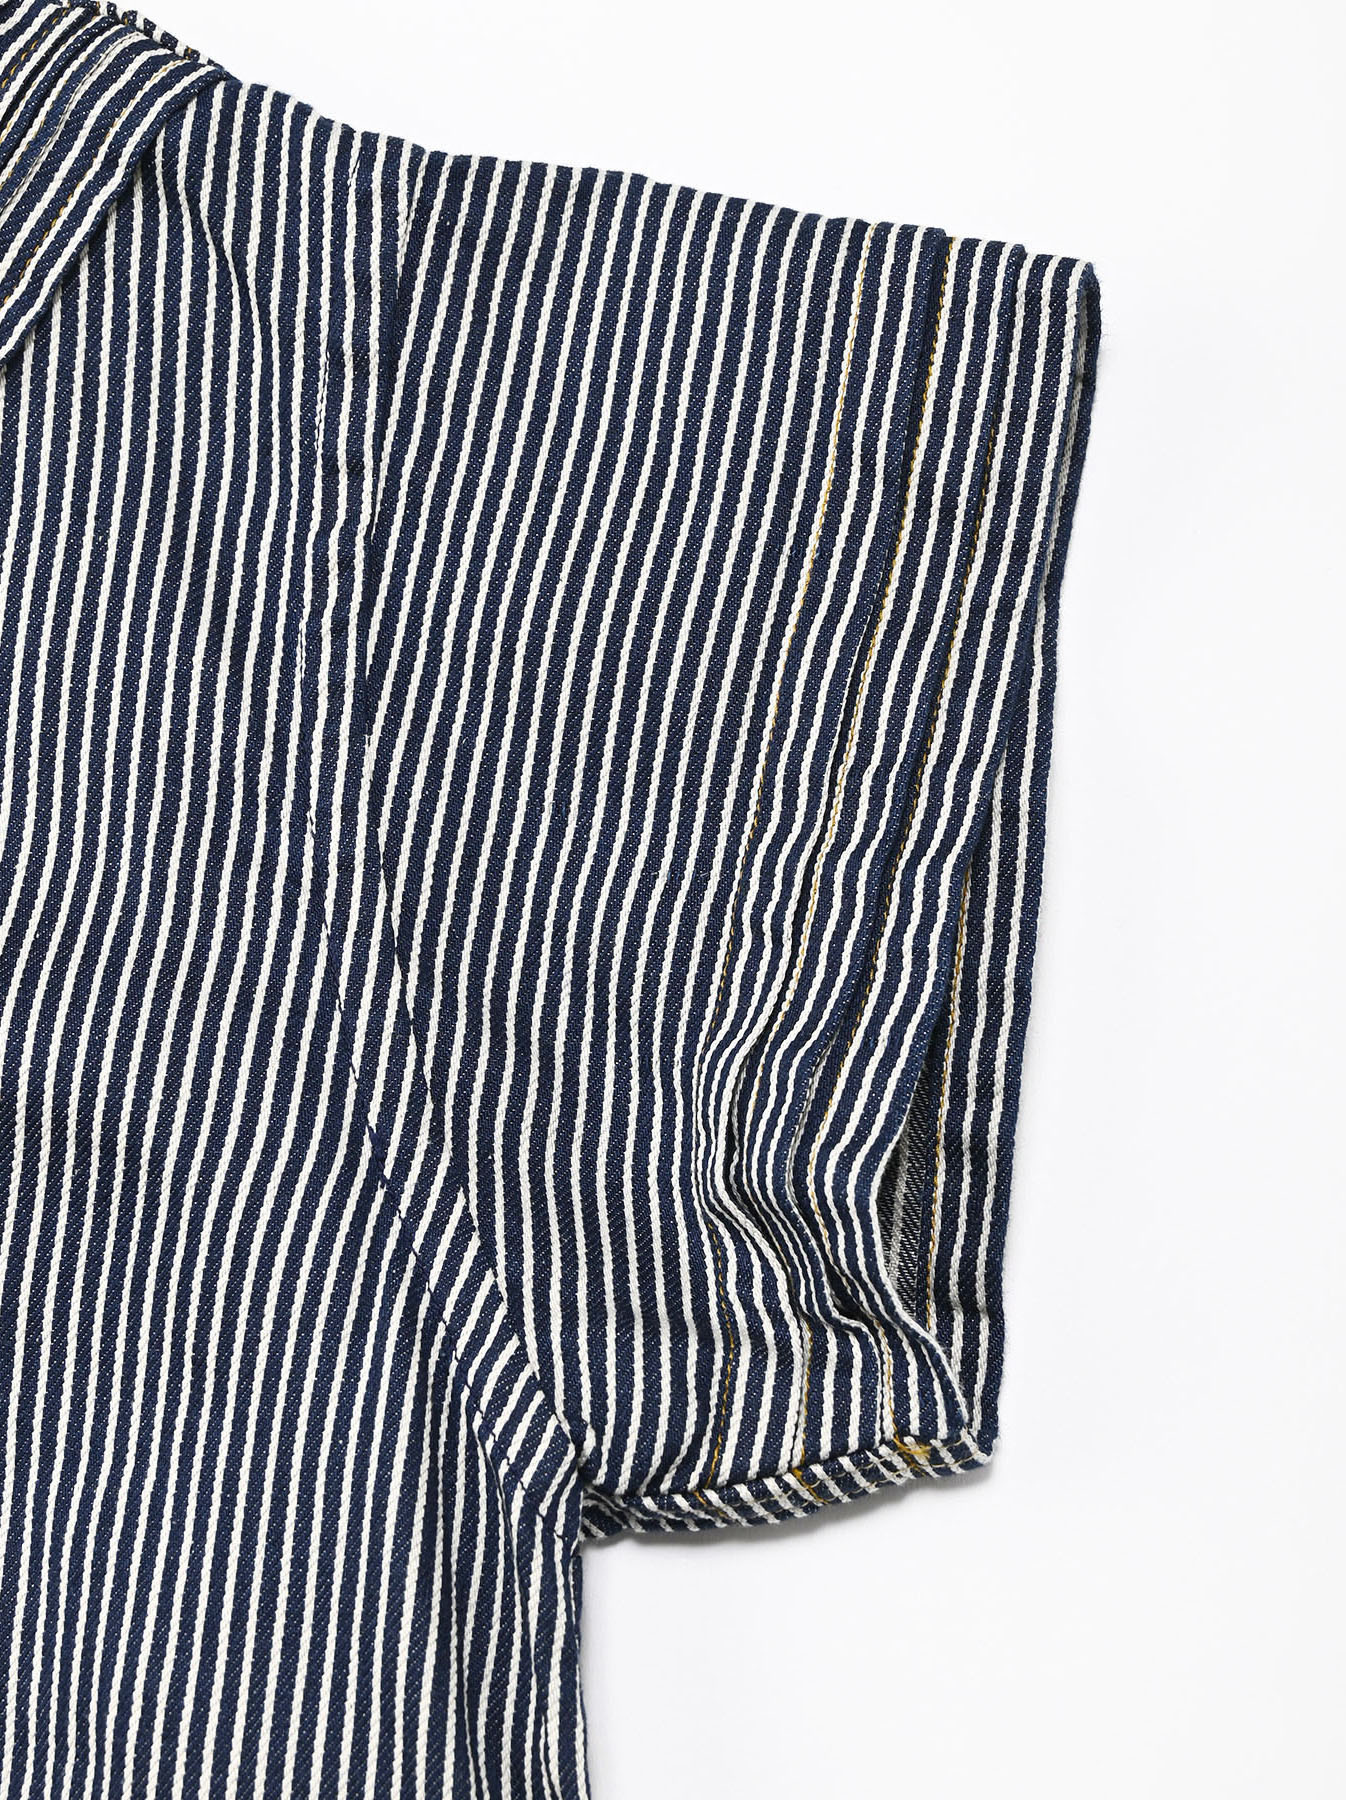 Komugi Denim Tuck Lace T-shirt-8